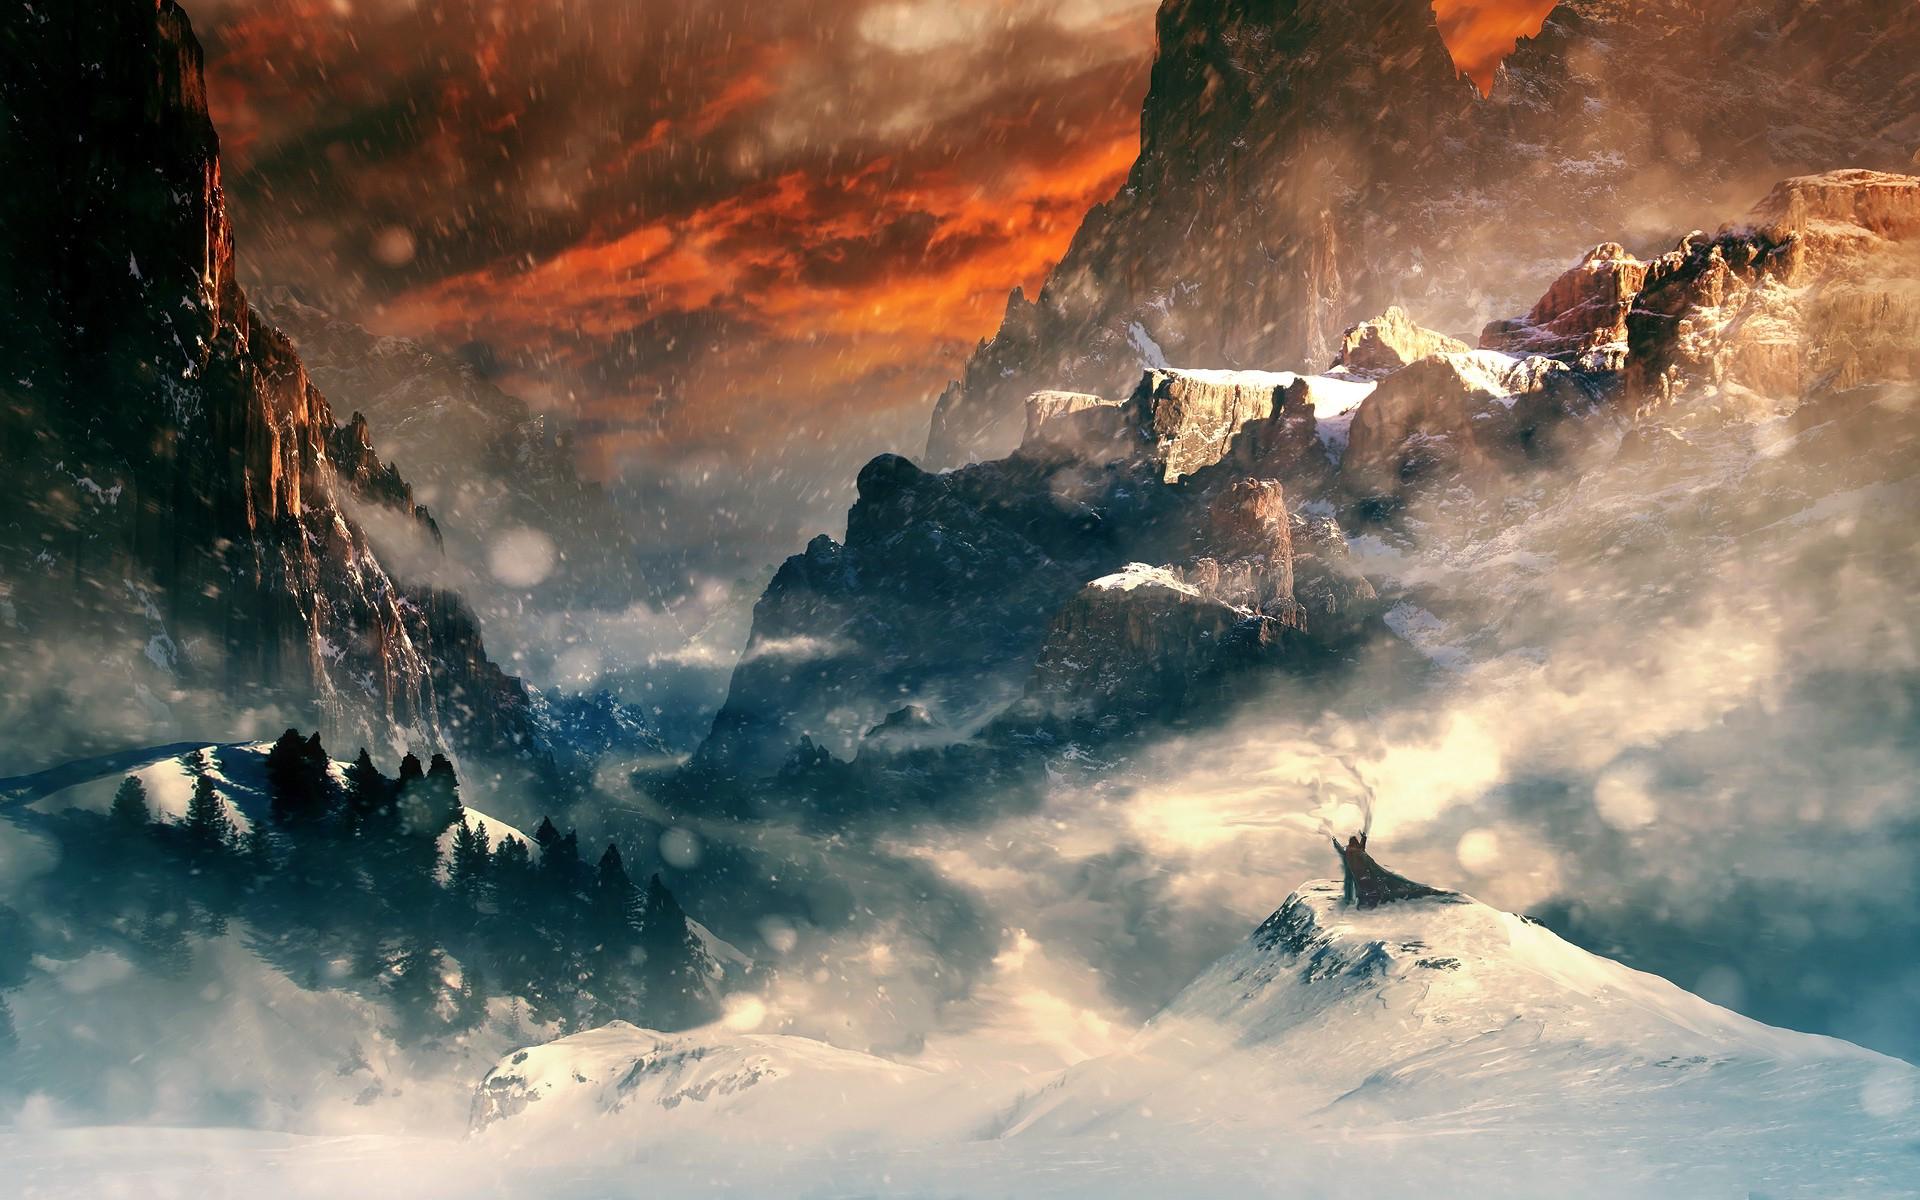 Fantasy snow world art